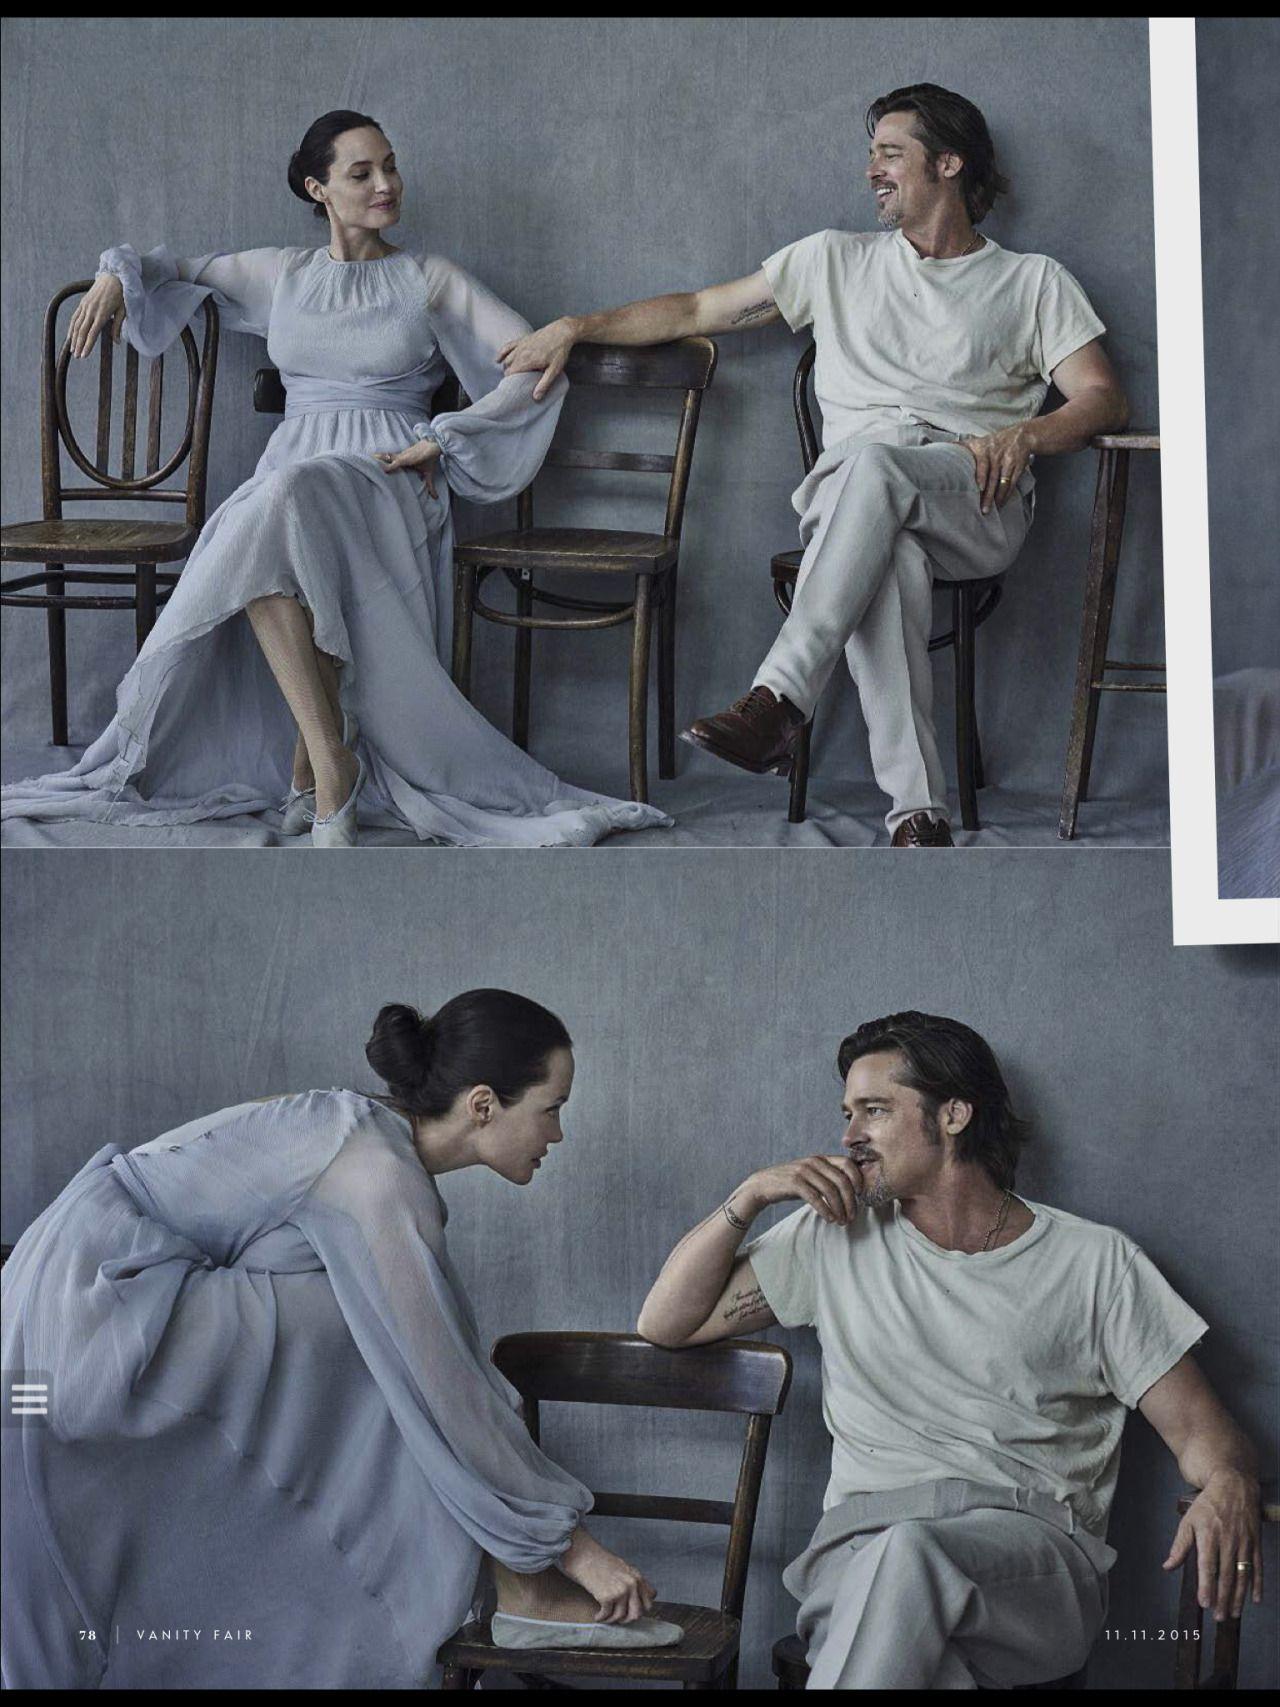 Brad Pitt and Angelina Jolie on the November 11, 2015 issue of Vanity Fair Italia.